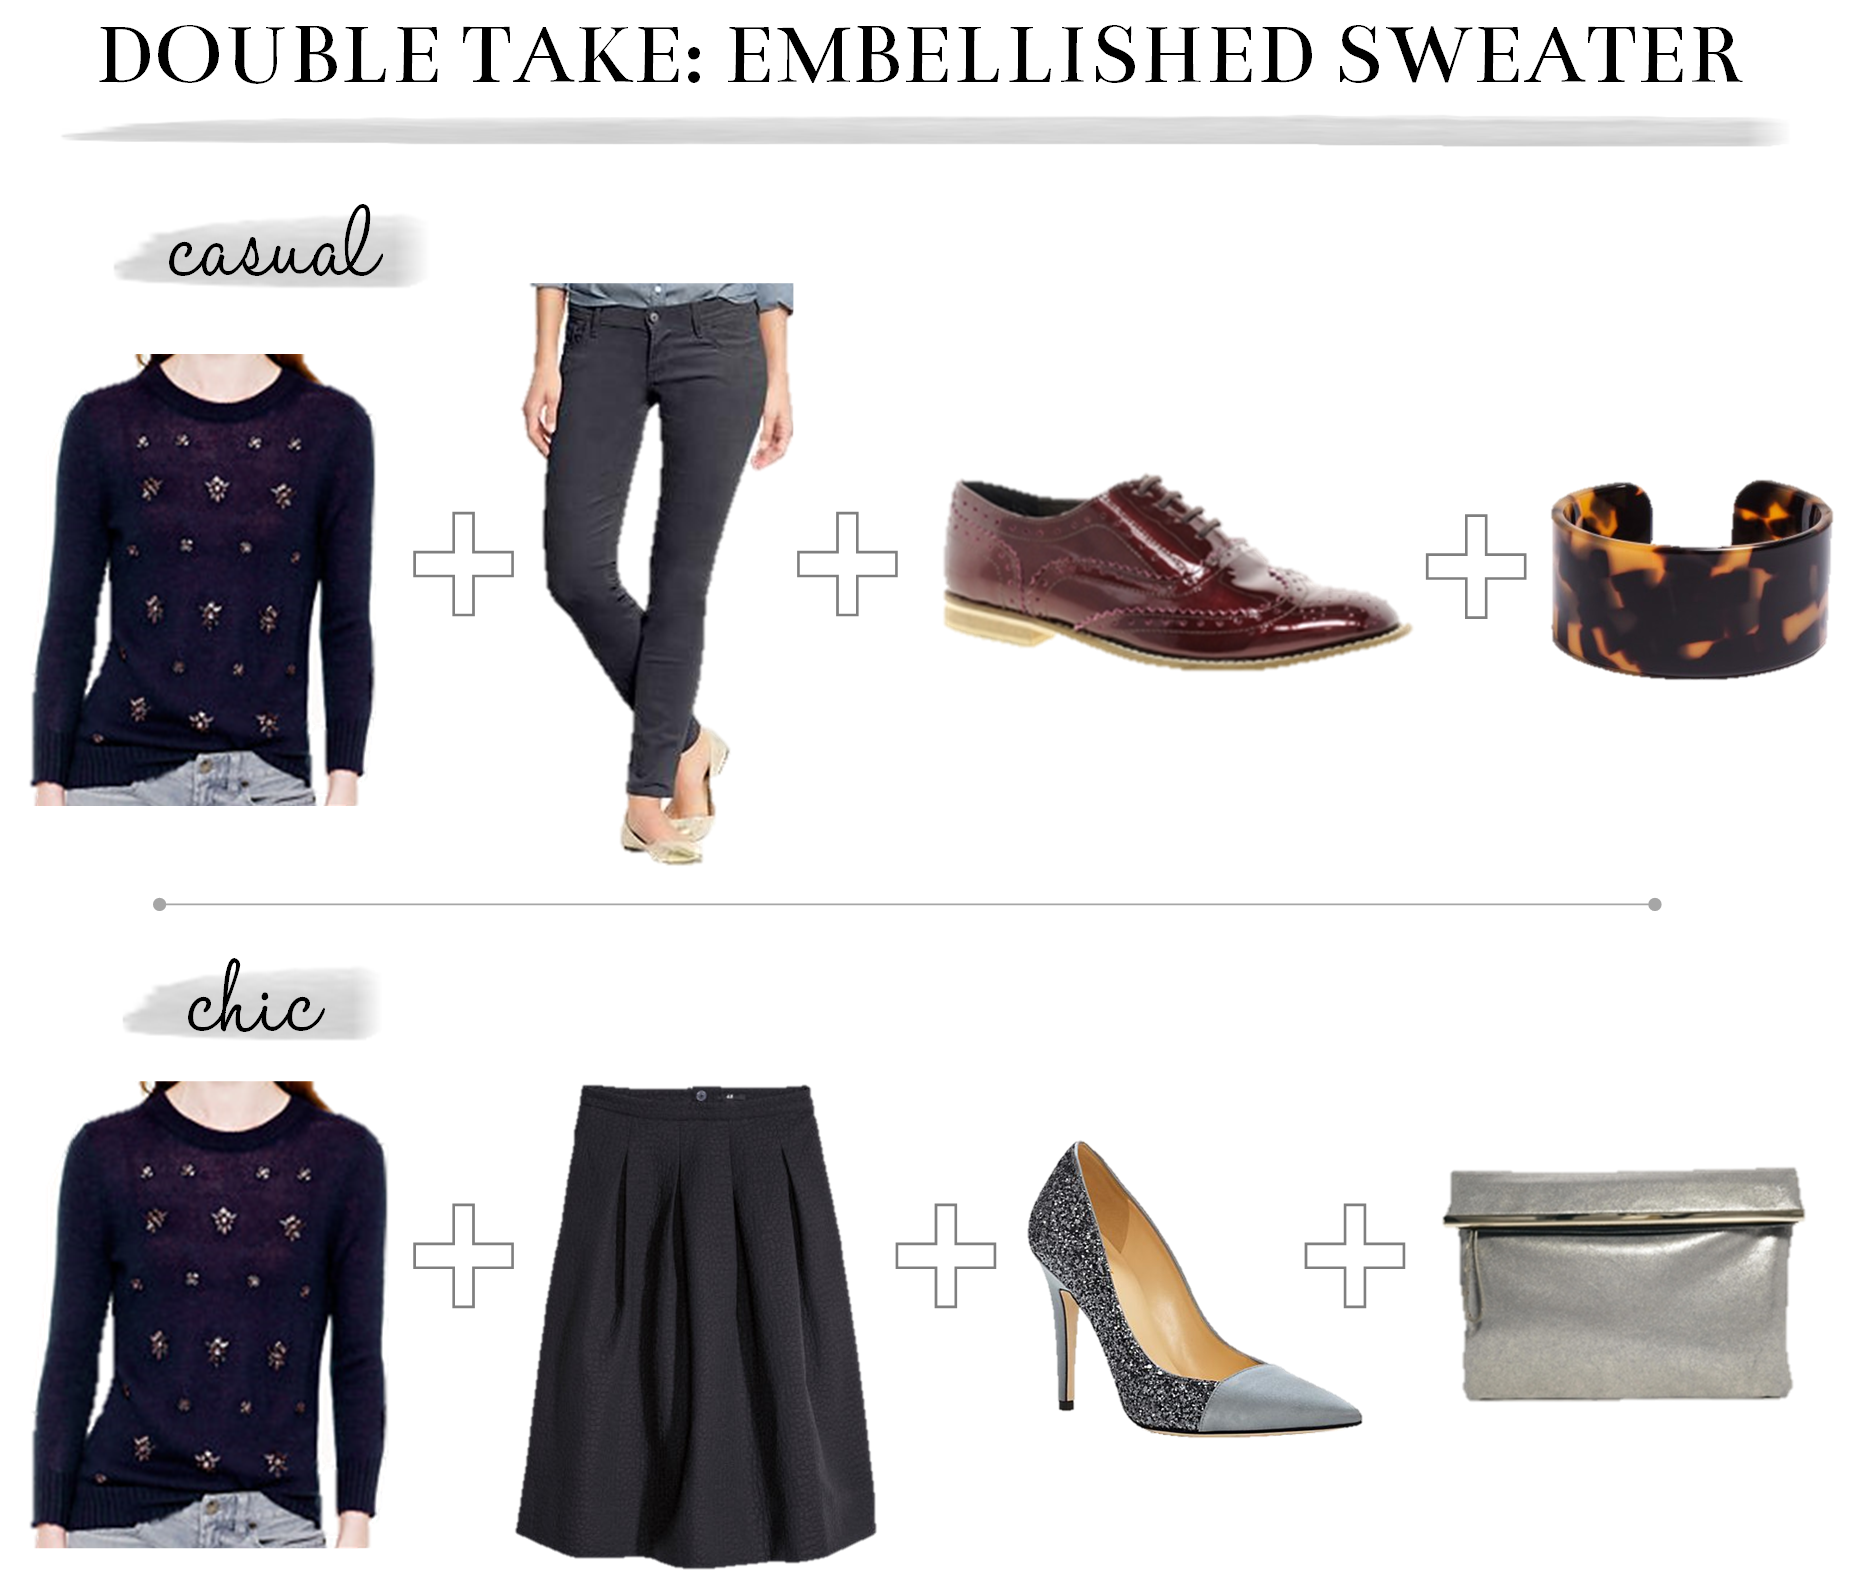 doubletake_embellishedsweater